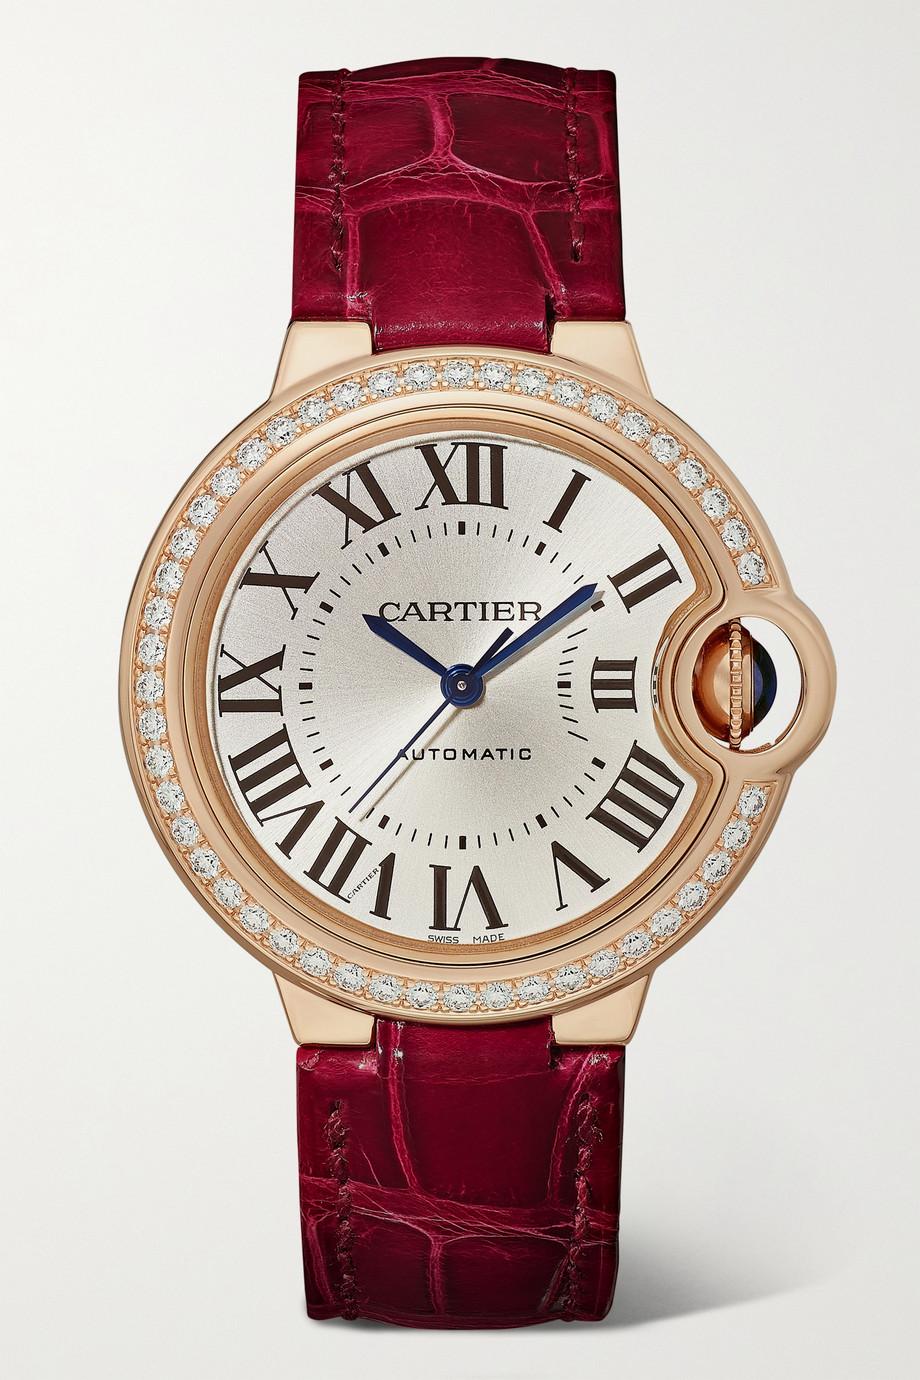 Cartier Ballon Bleu de Cartier Automatic 33 mm Uhr aus 18 Karat Roségold mit Diamanten und Alligatorlederarmband